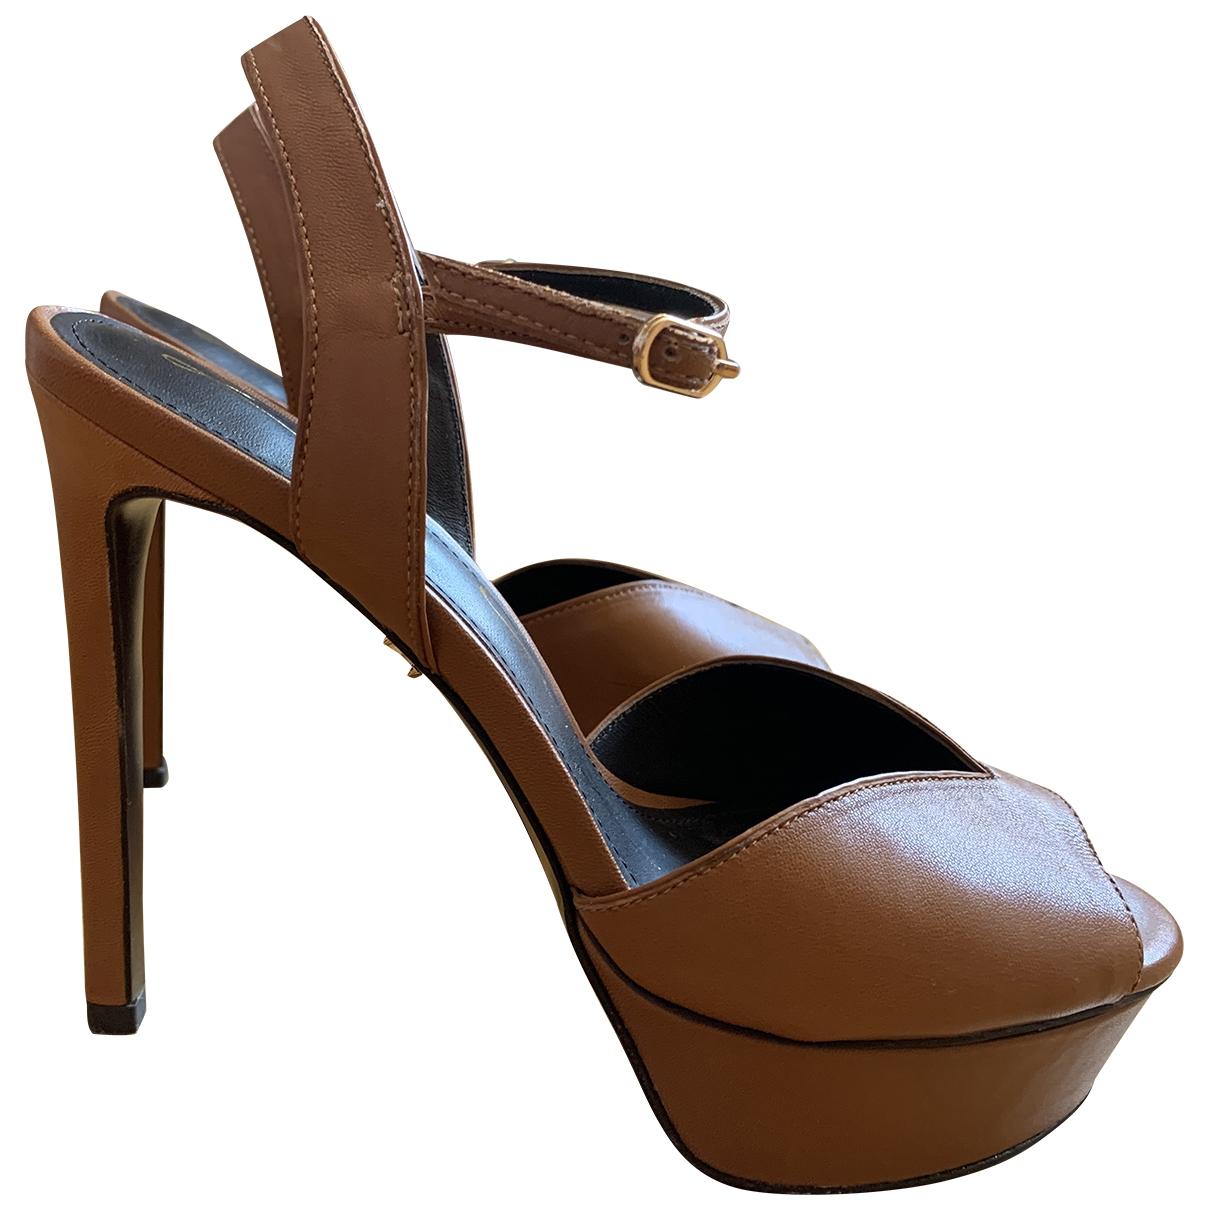 Lola Cruz - Escarpins   pour femme en cuir - marron